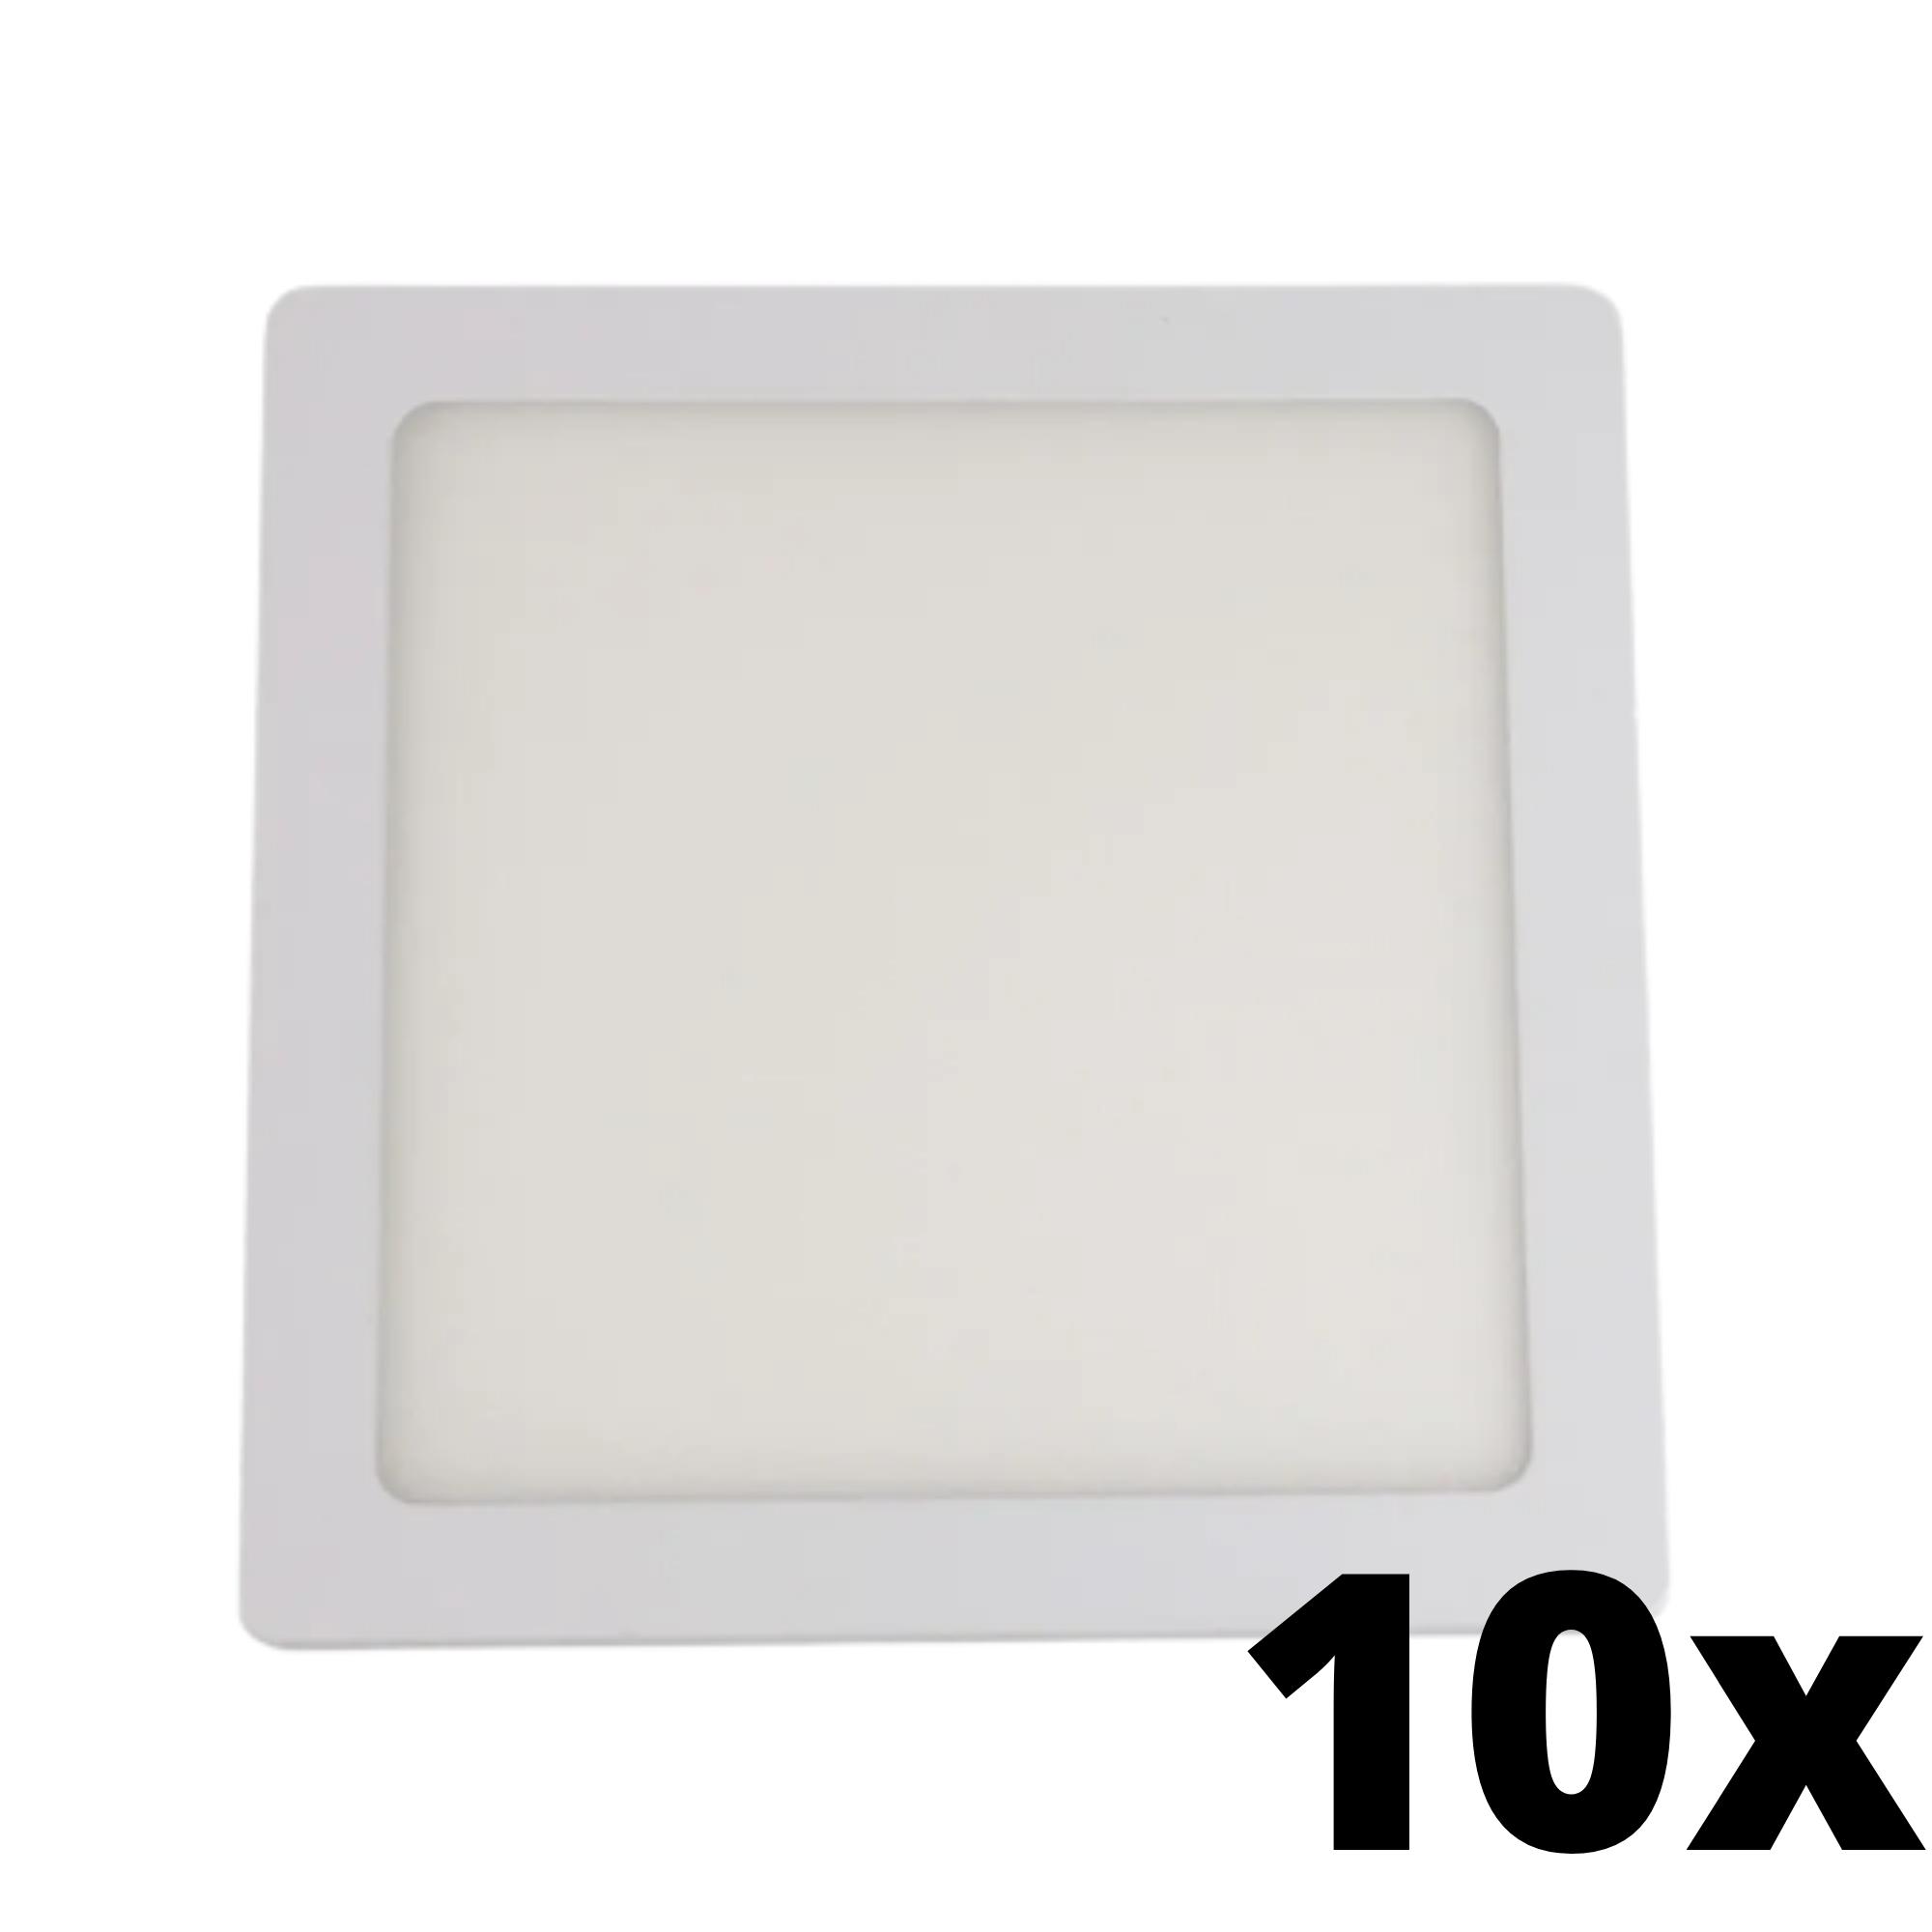 Kit 10 und Painel de Led Embutir 12w Quadrado 3000k